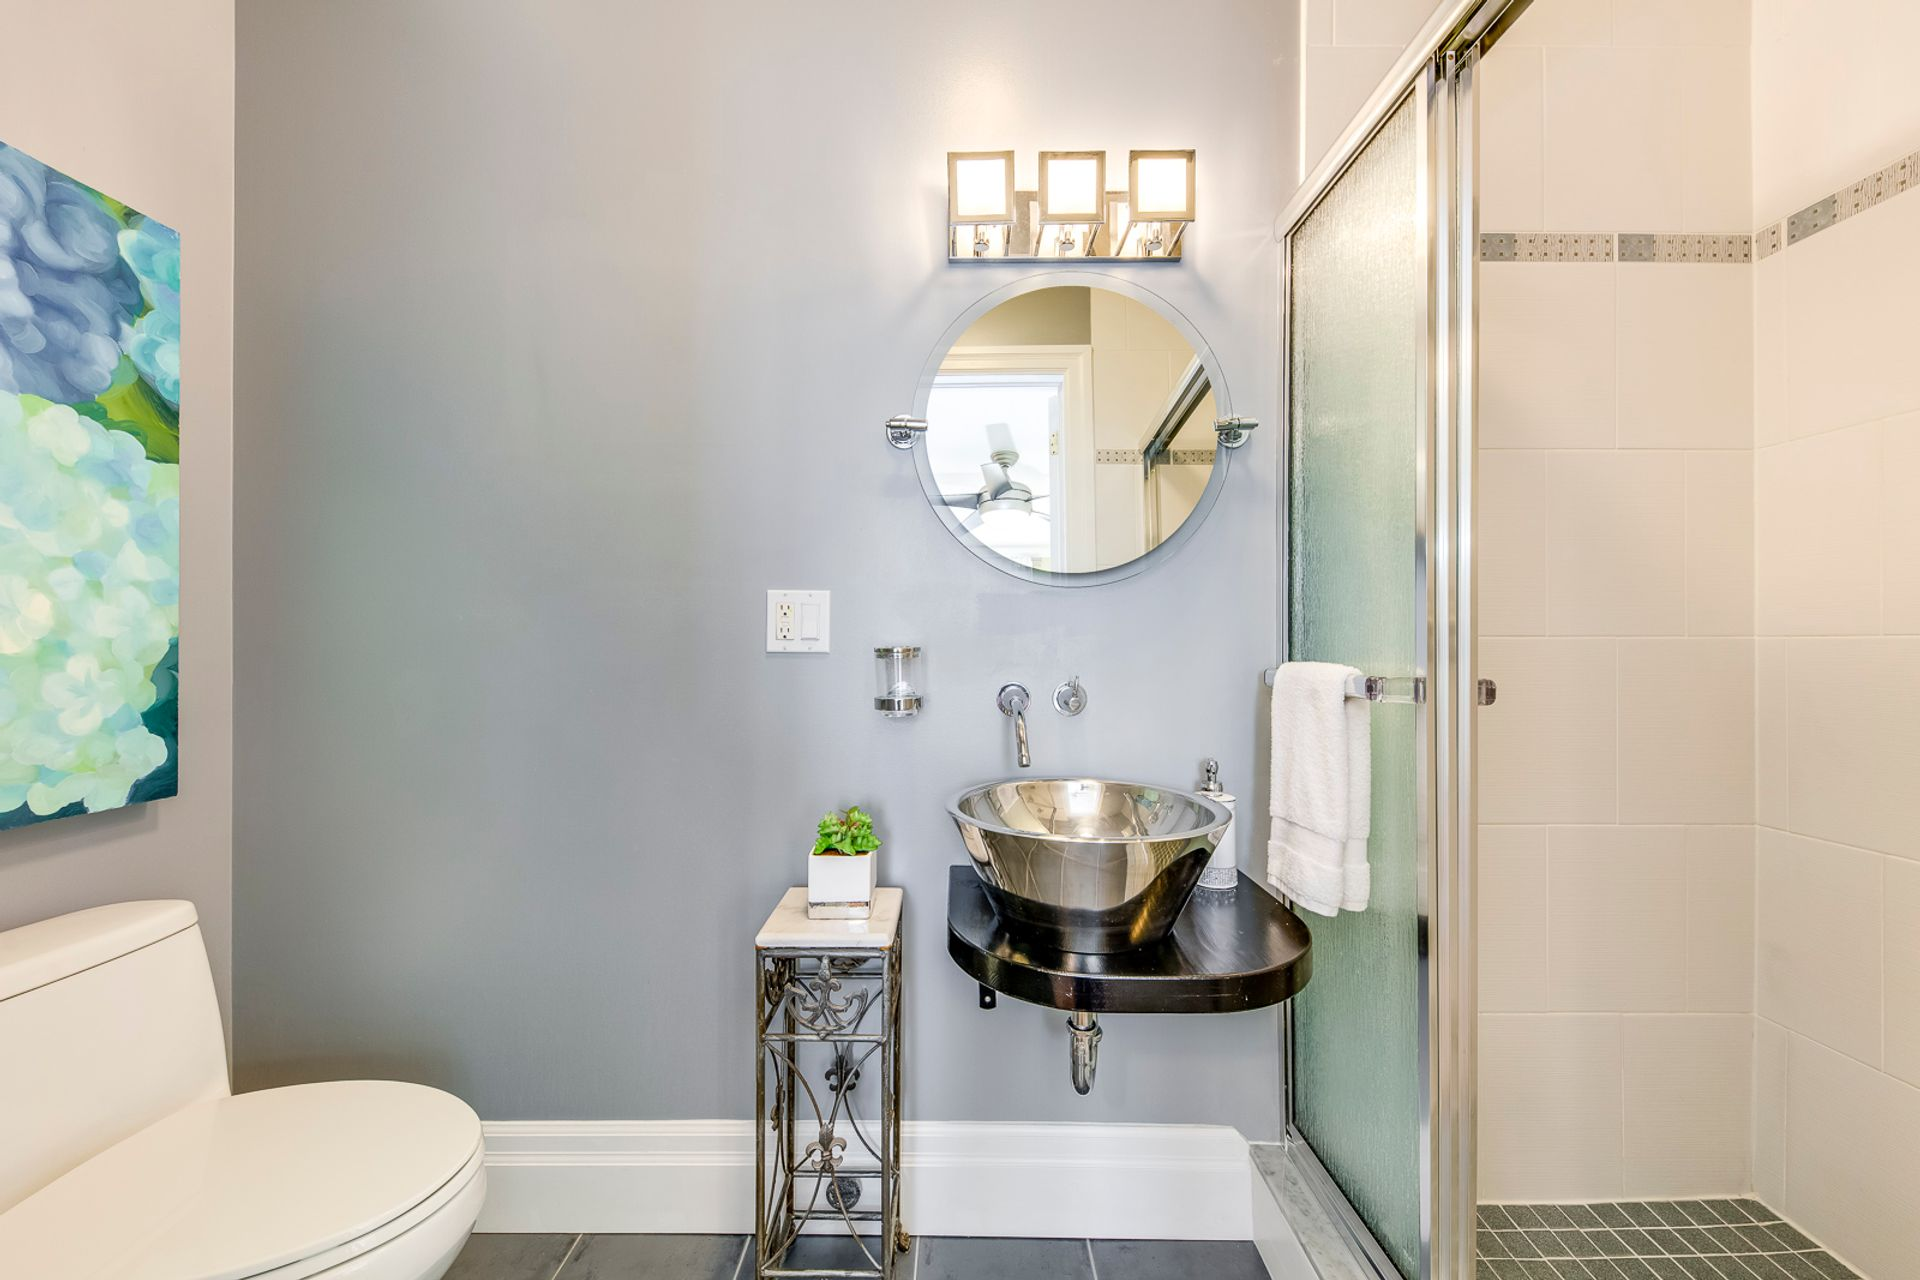 2nd Bedroom Ensuite - 1321 Brookstar Drive, Oakville - Elite3 & Team at 437 Allan Street, Old Oakville, Oakville